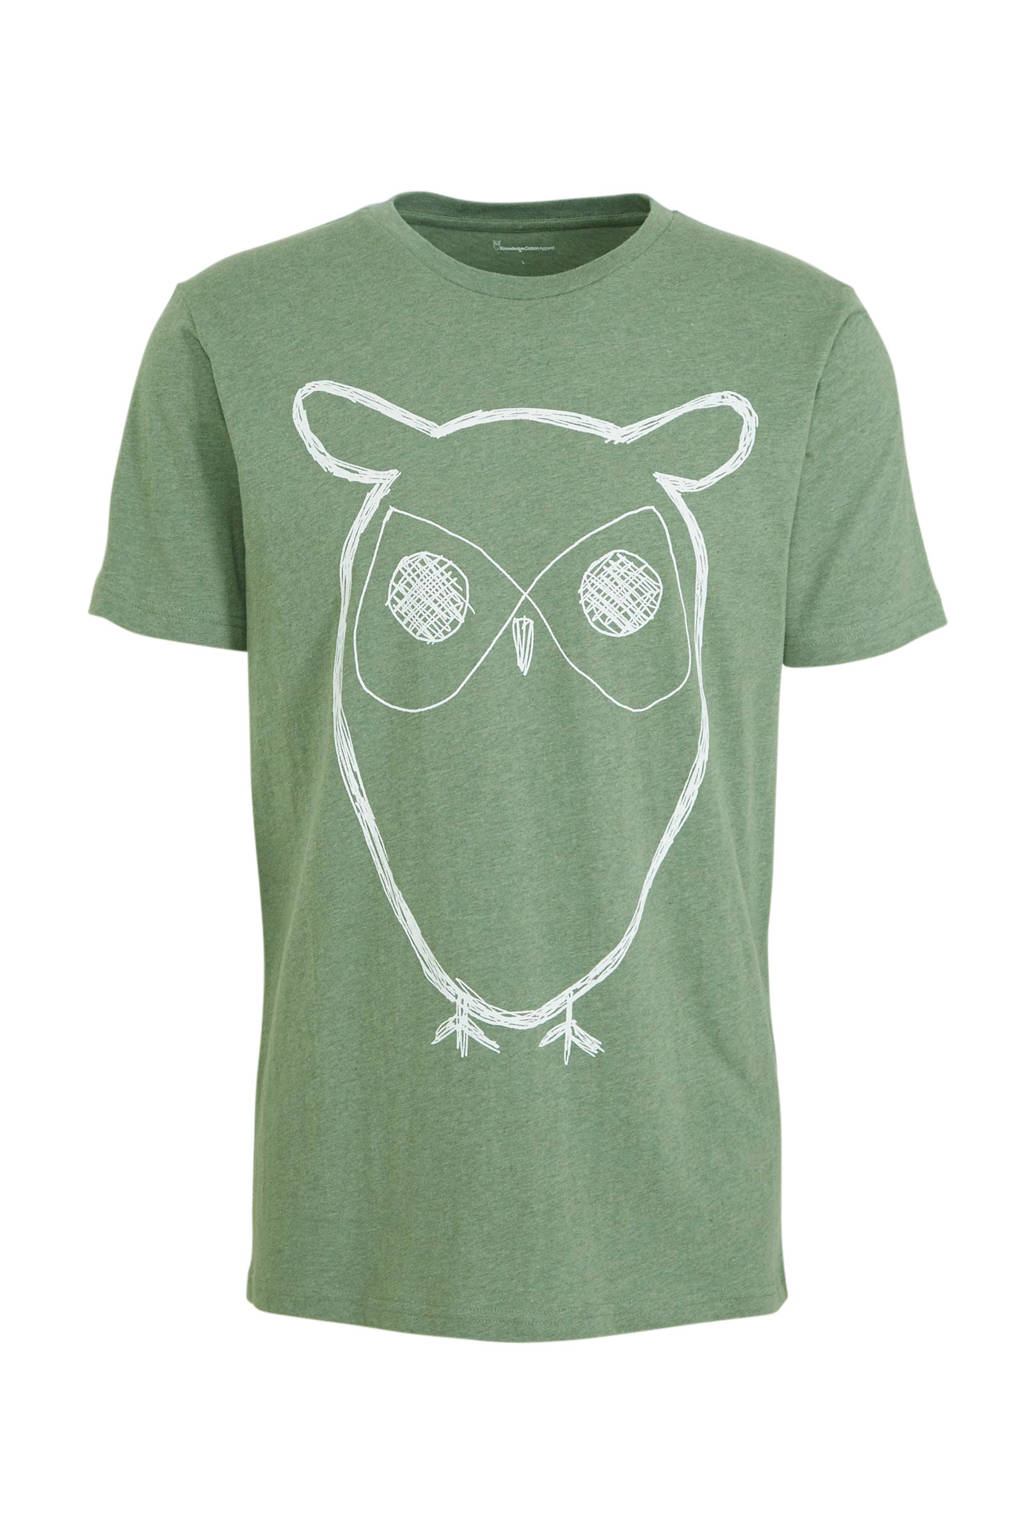 Knowledge Cotton Apparel T-shirt met printopdruk groen, Groen